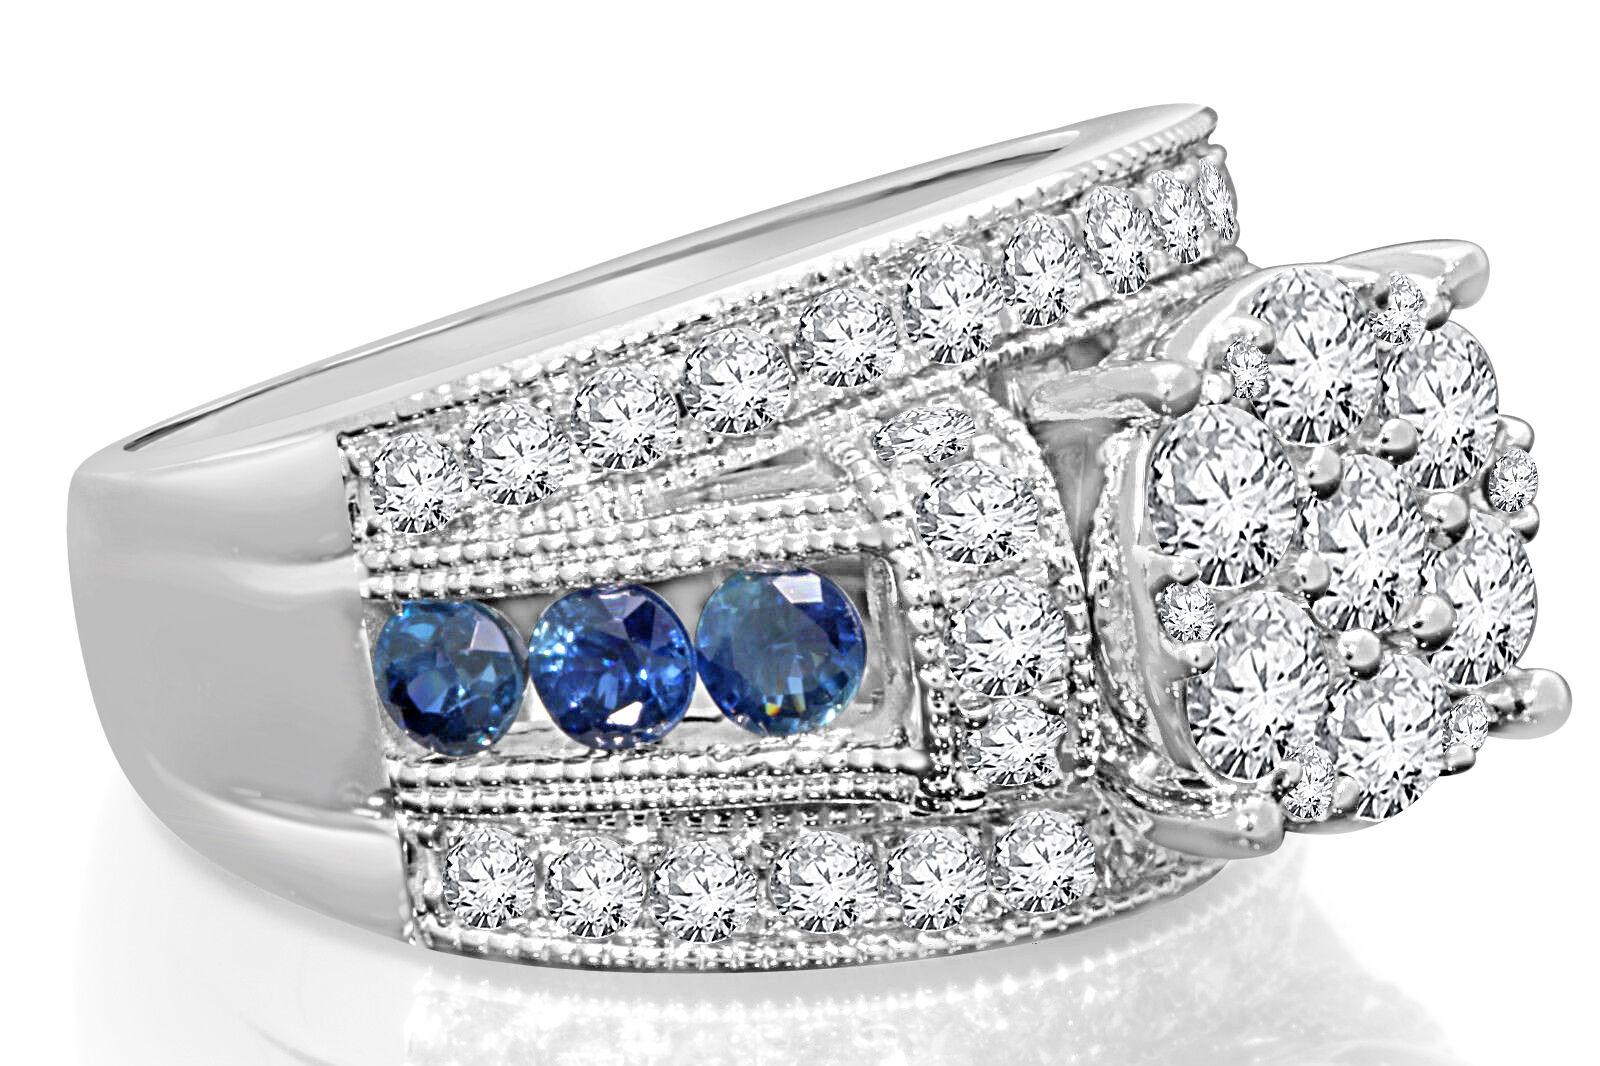 10K WHITE GOLD 3.26 CARAT WOMEN DIAMOND SAPPHIRE